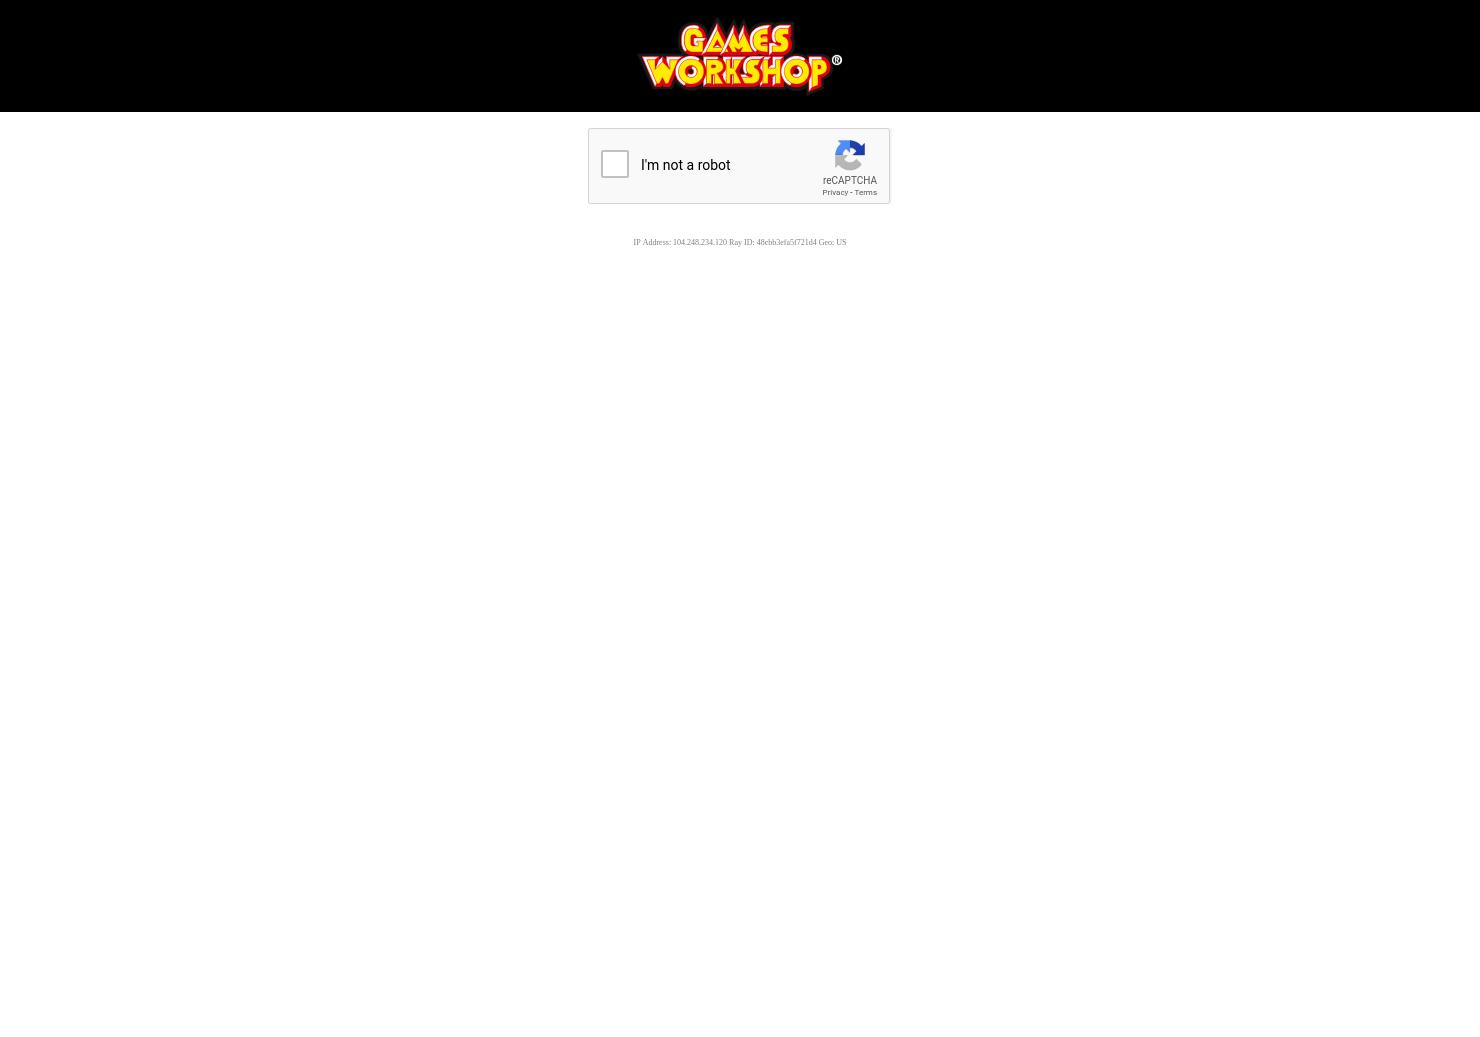 Games Workshop Home Page